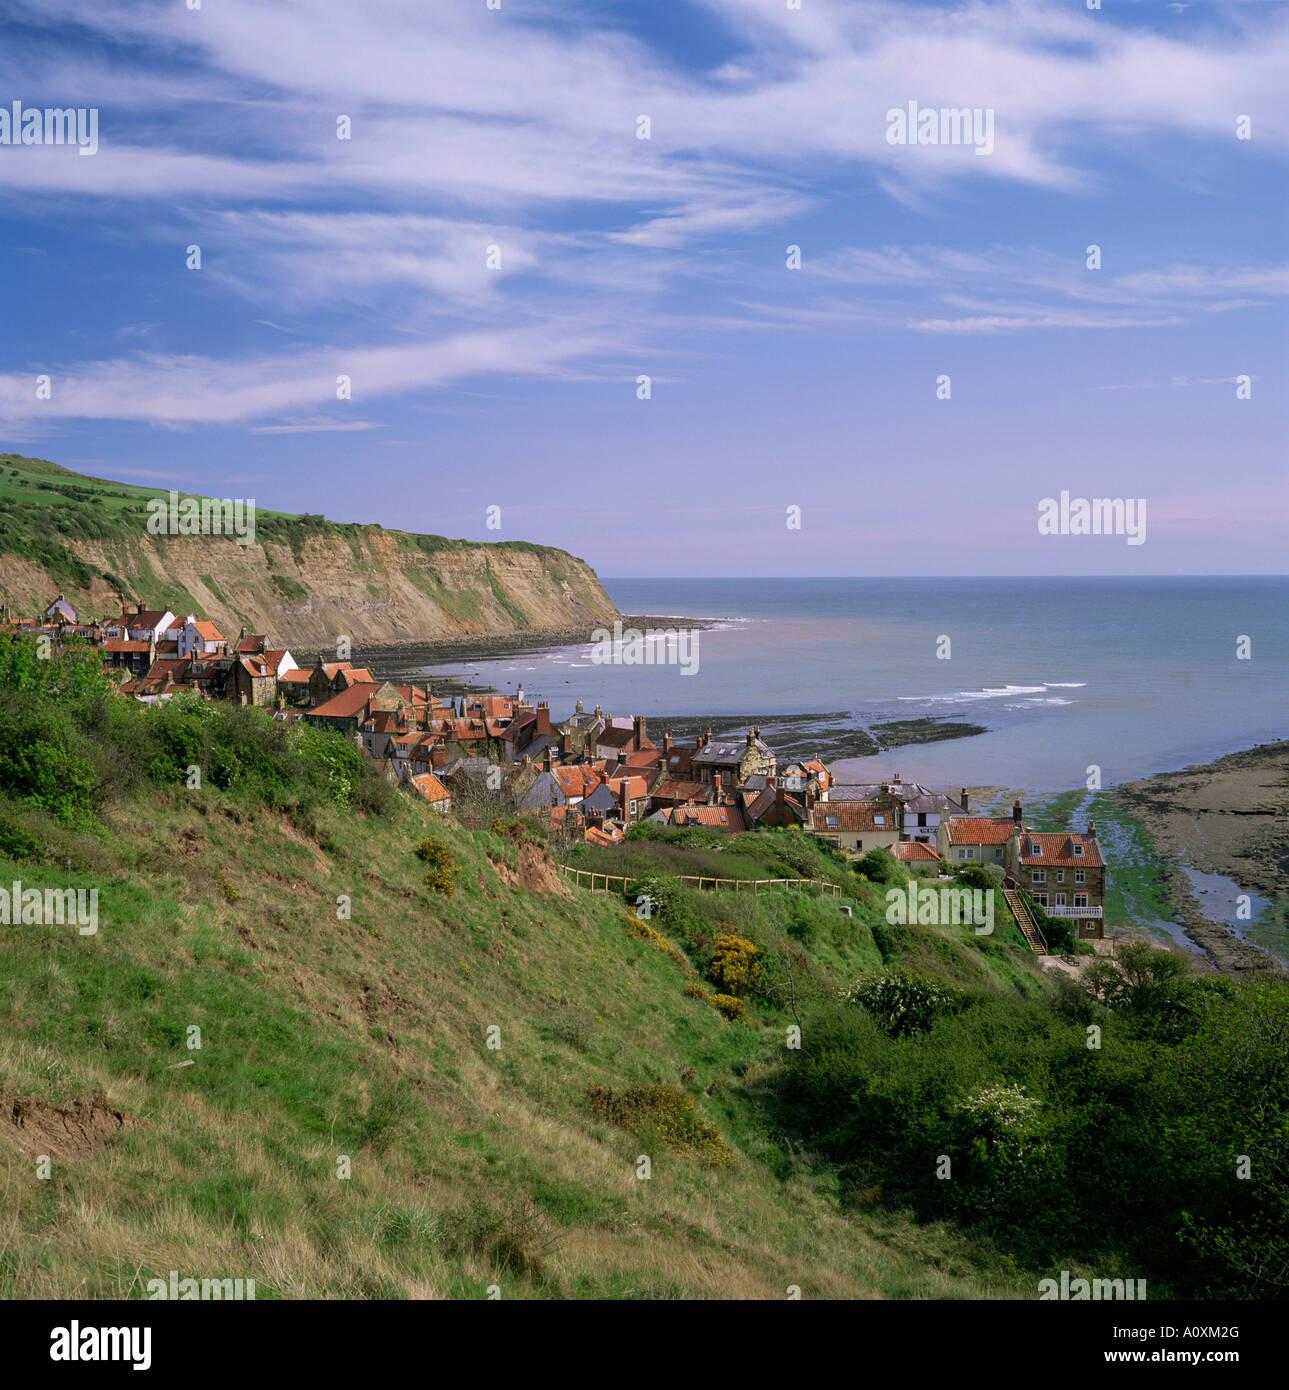 Robin Hood s Bay Yorkshire England United Kingdom Europe - Stock Image